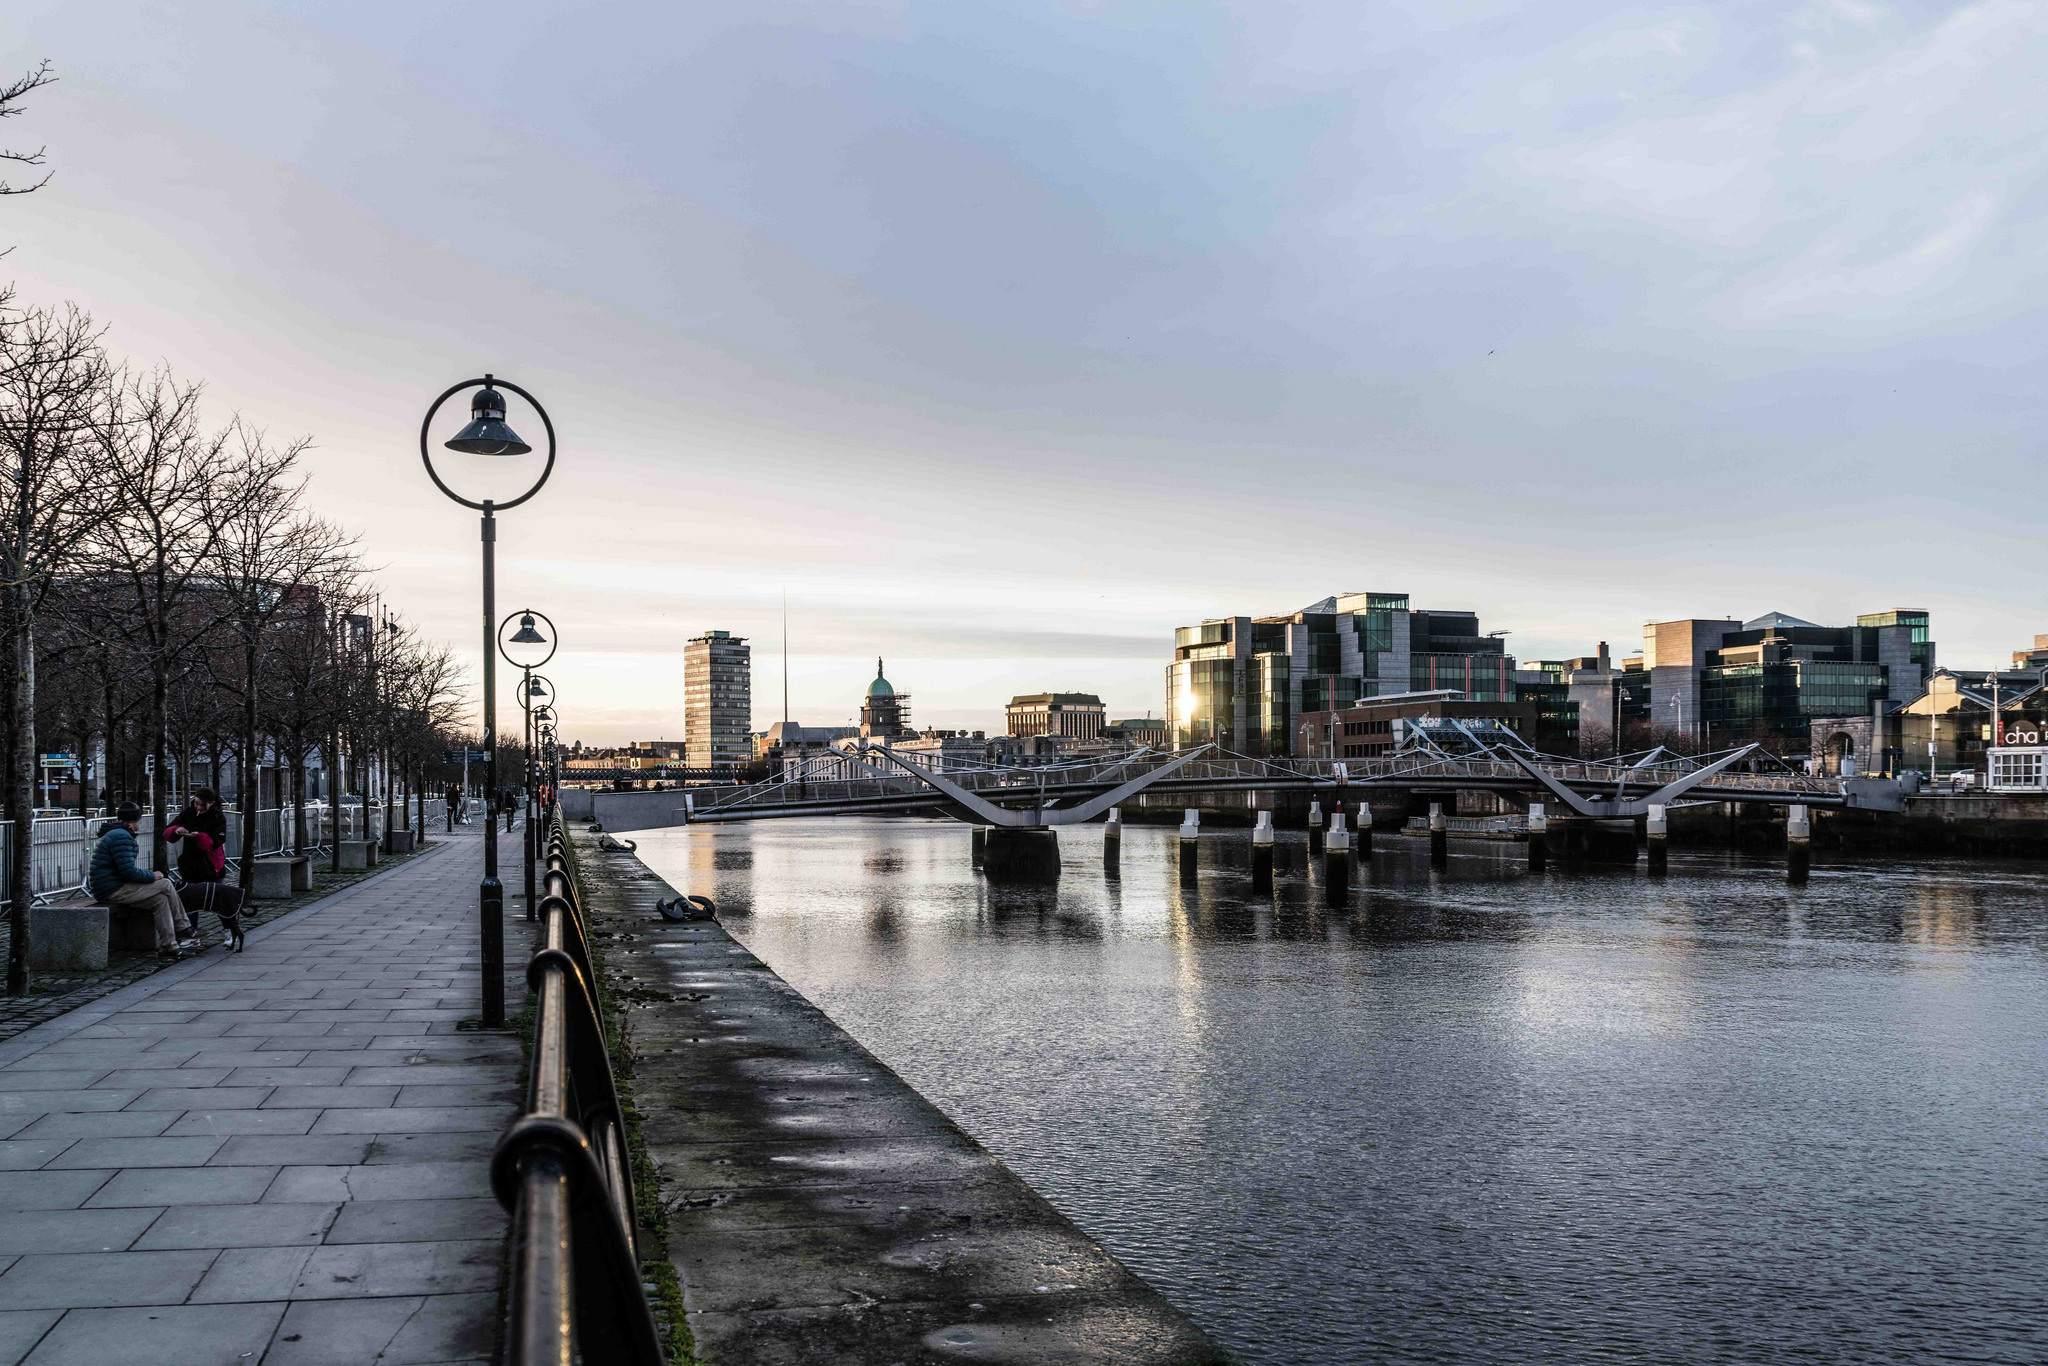 dublin docklands7 Walking Around Dublin Docklands by Marphy